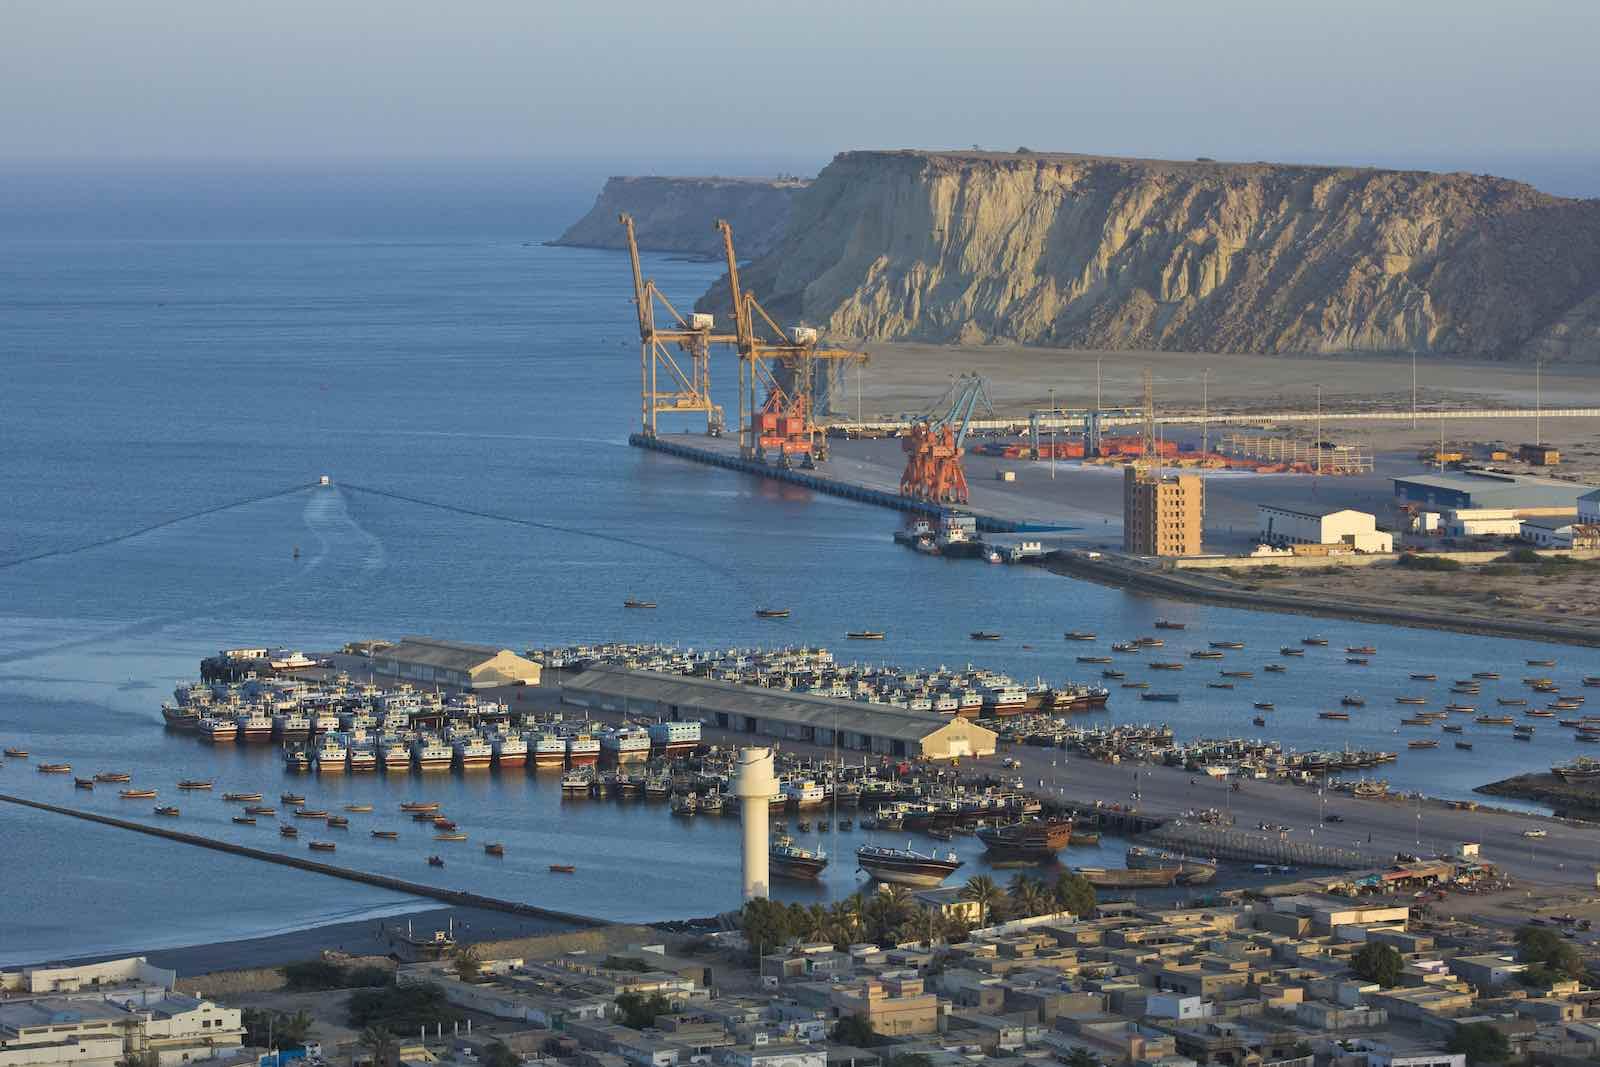 Strategic Significance of Pakistan's Gwadar Port in the Region By MD Pathik Hasan